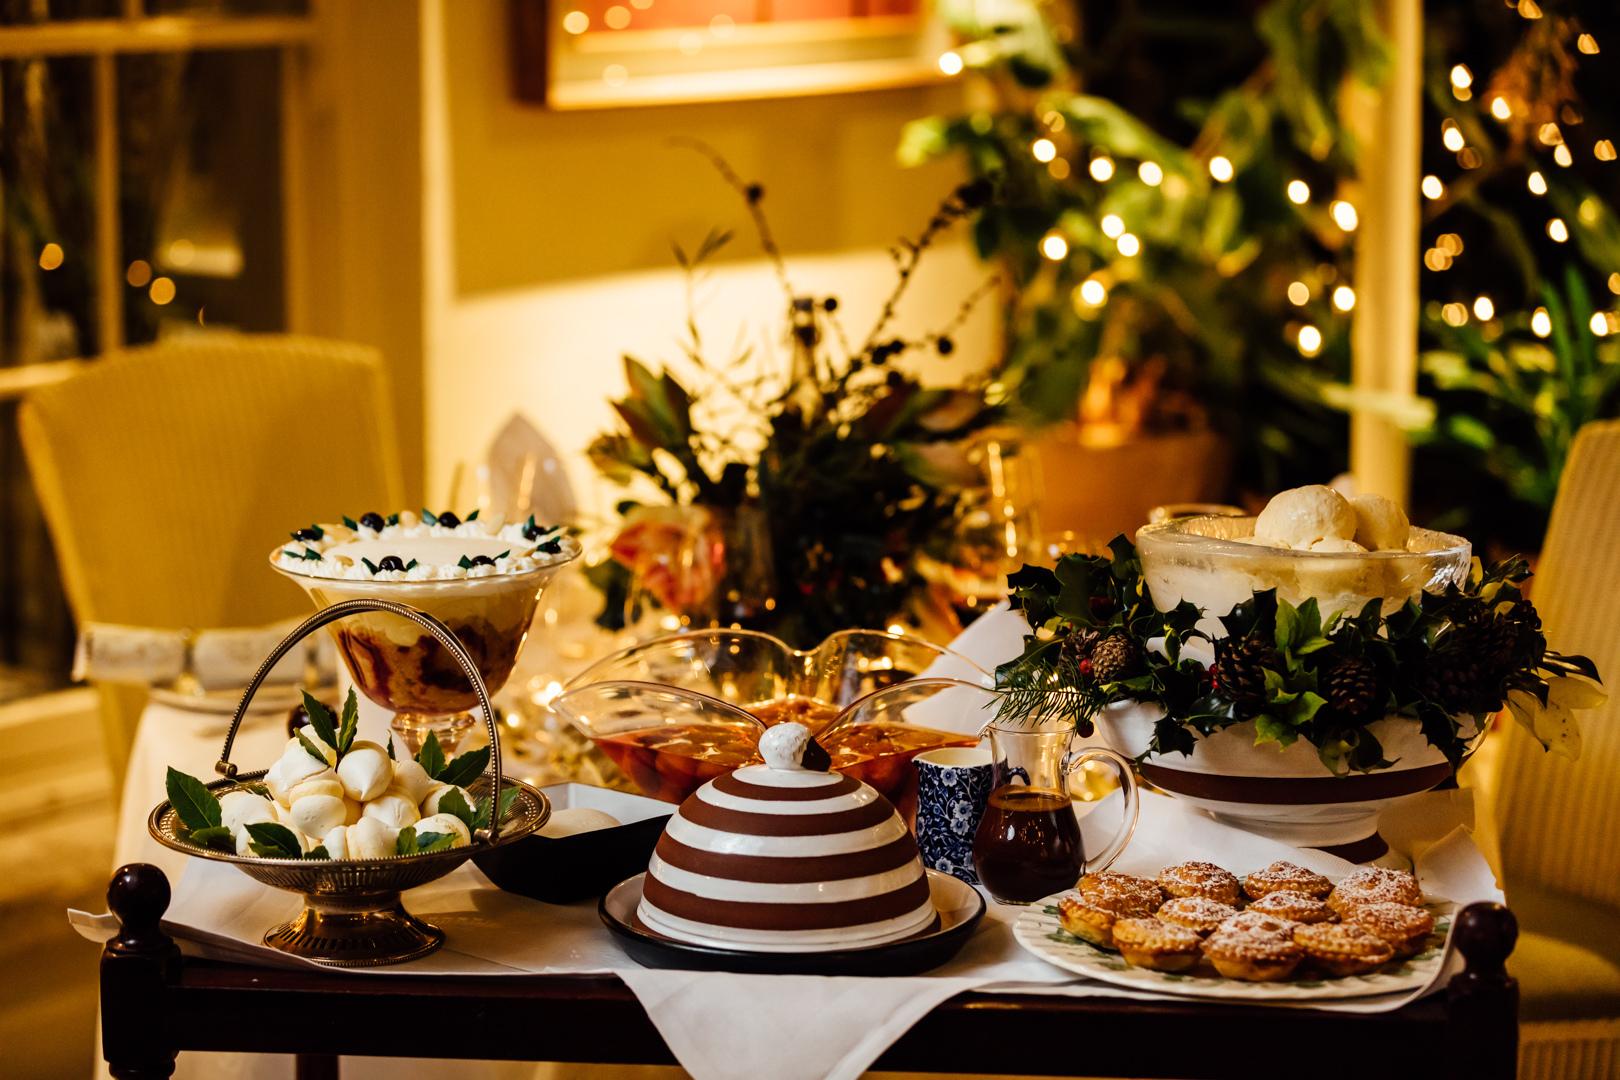 Festive Celebrations at Ballymaloe House